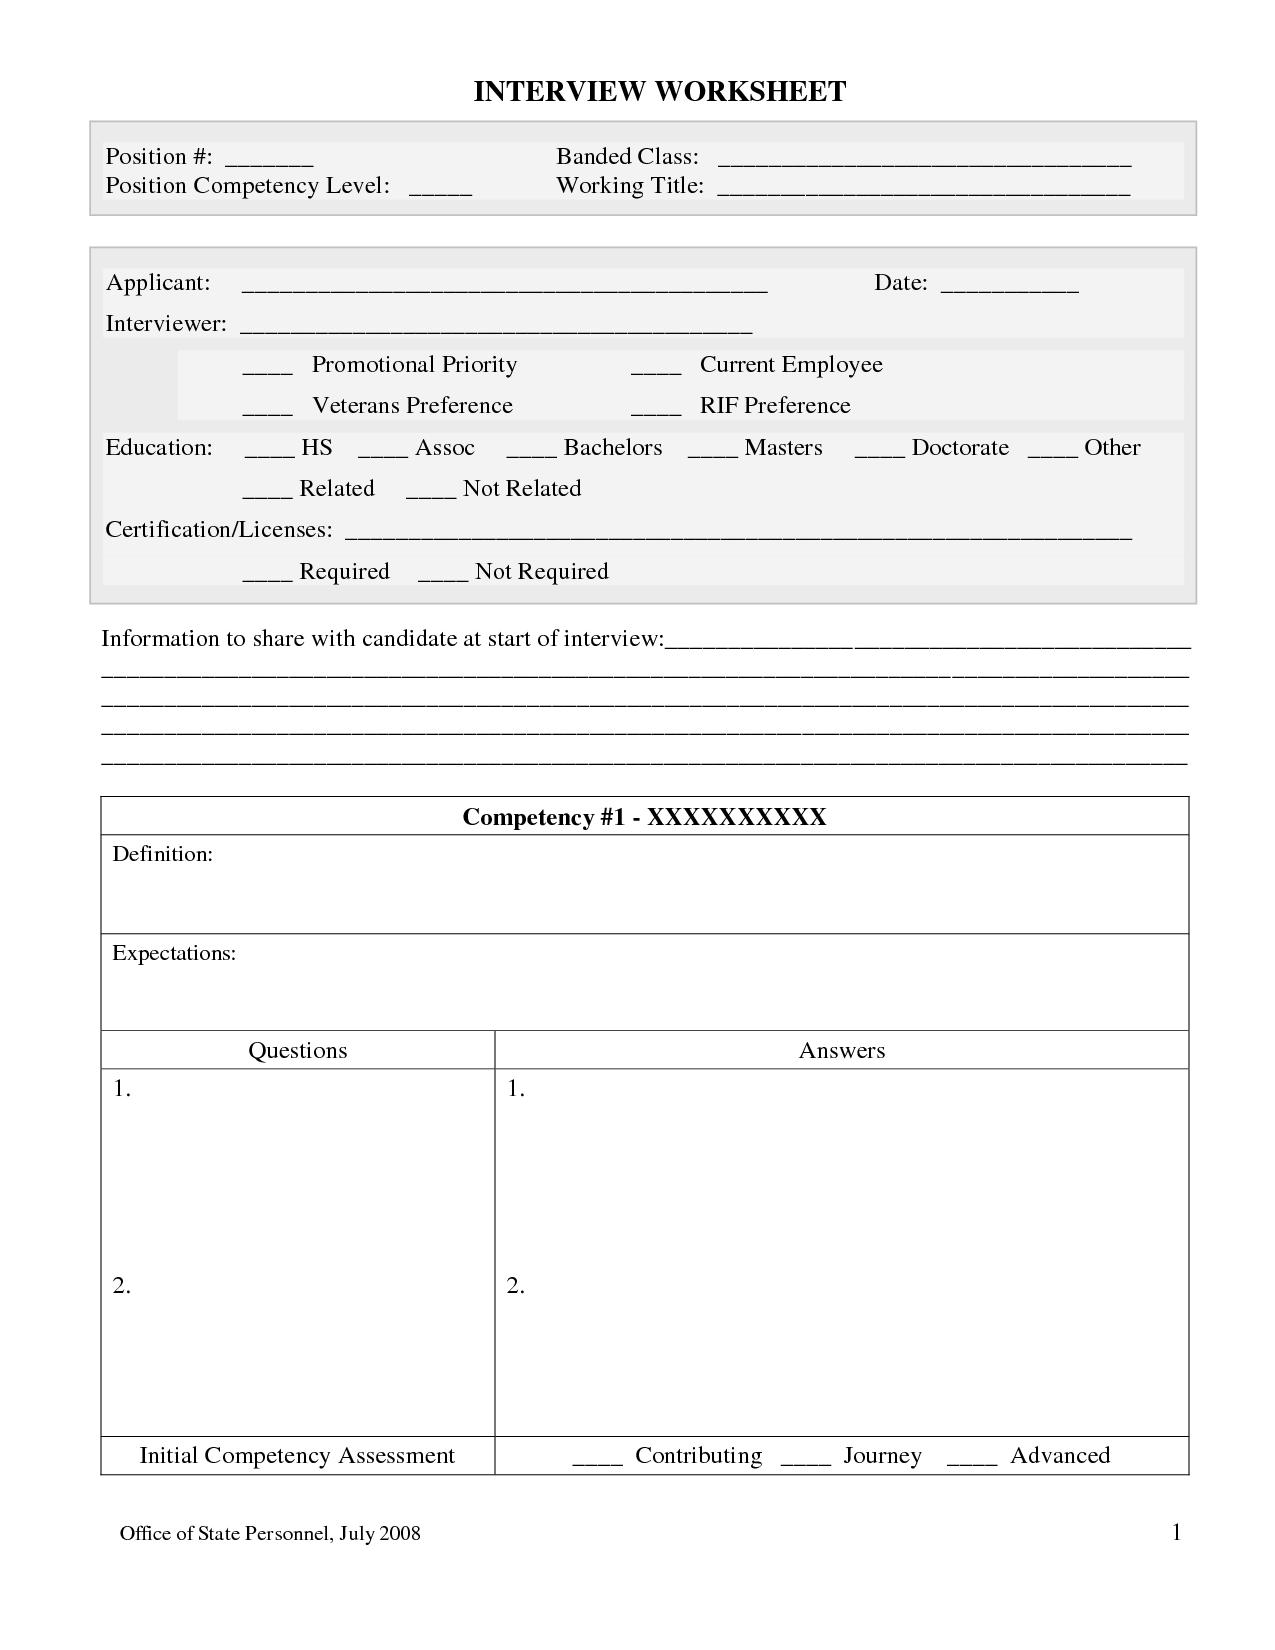 Spatial Questions Worksheet